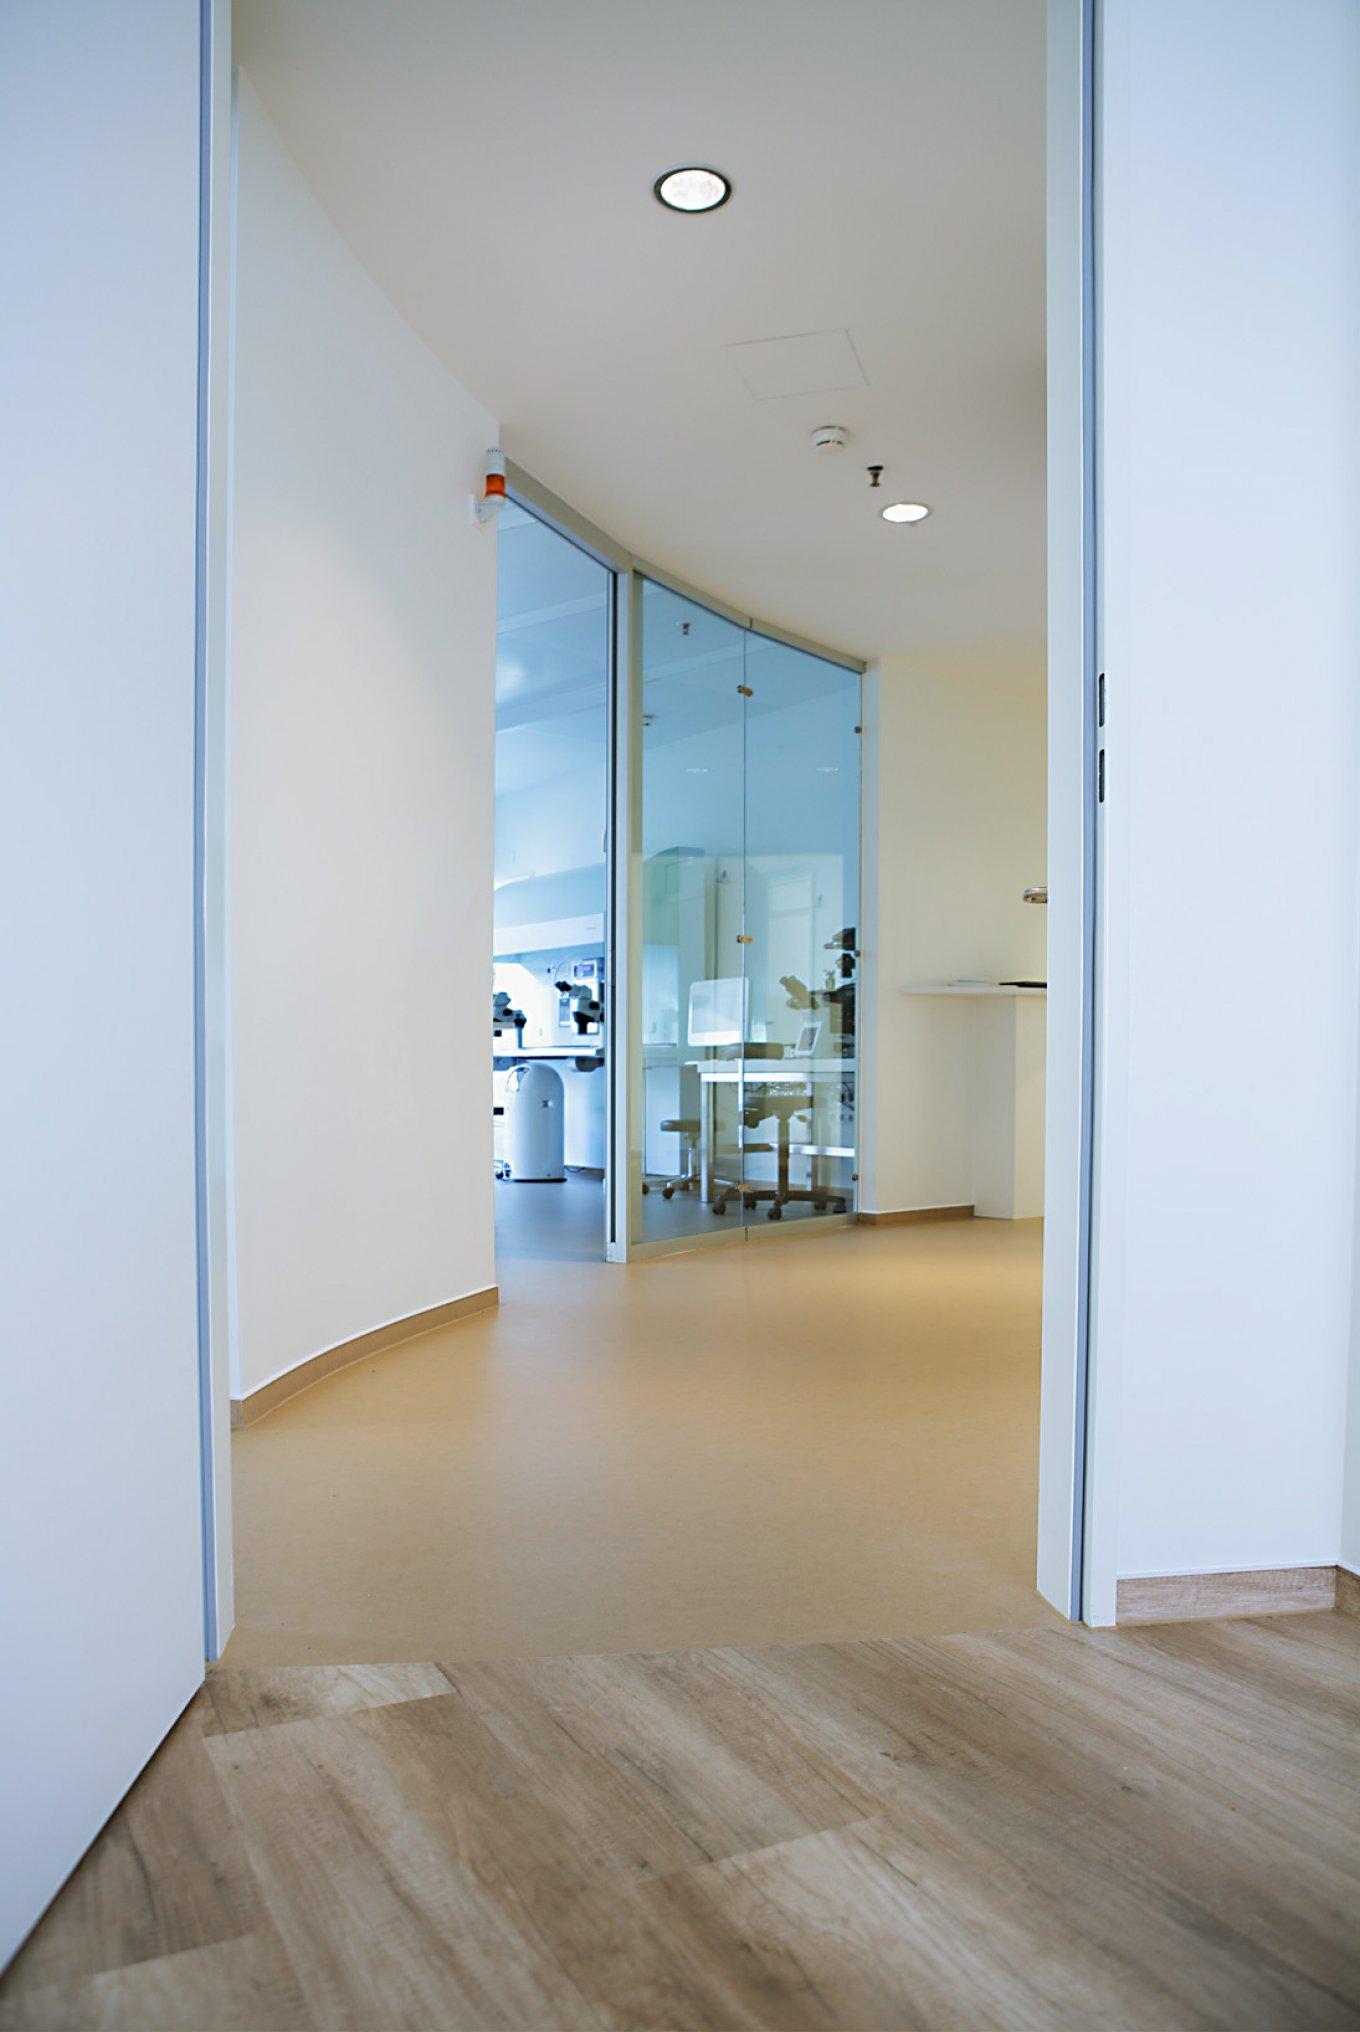 wineo Bodenbelag PURLINE Bioboden im Flur Holzoptik hell Fantasieoptik Übergang Klinik